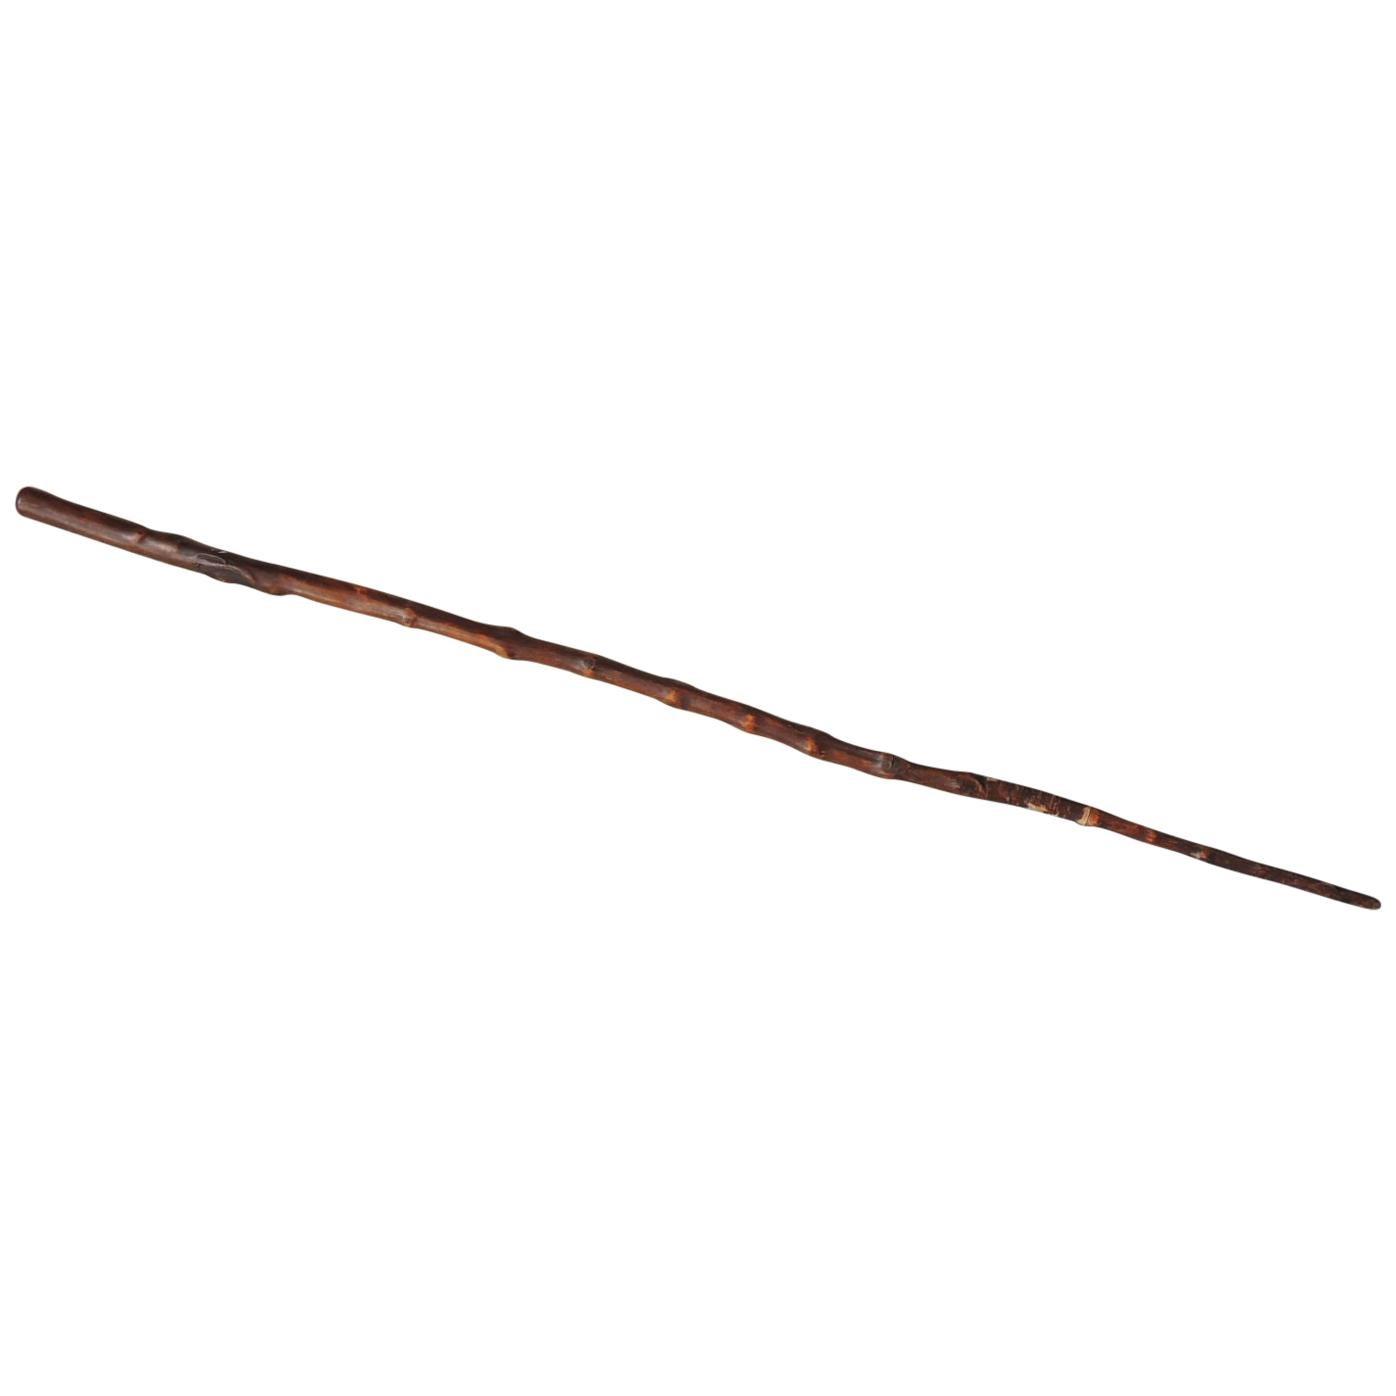 Antique Willow Dark Color Walking Stick/Cane